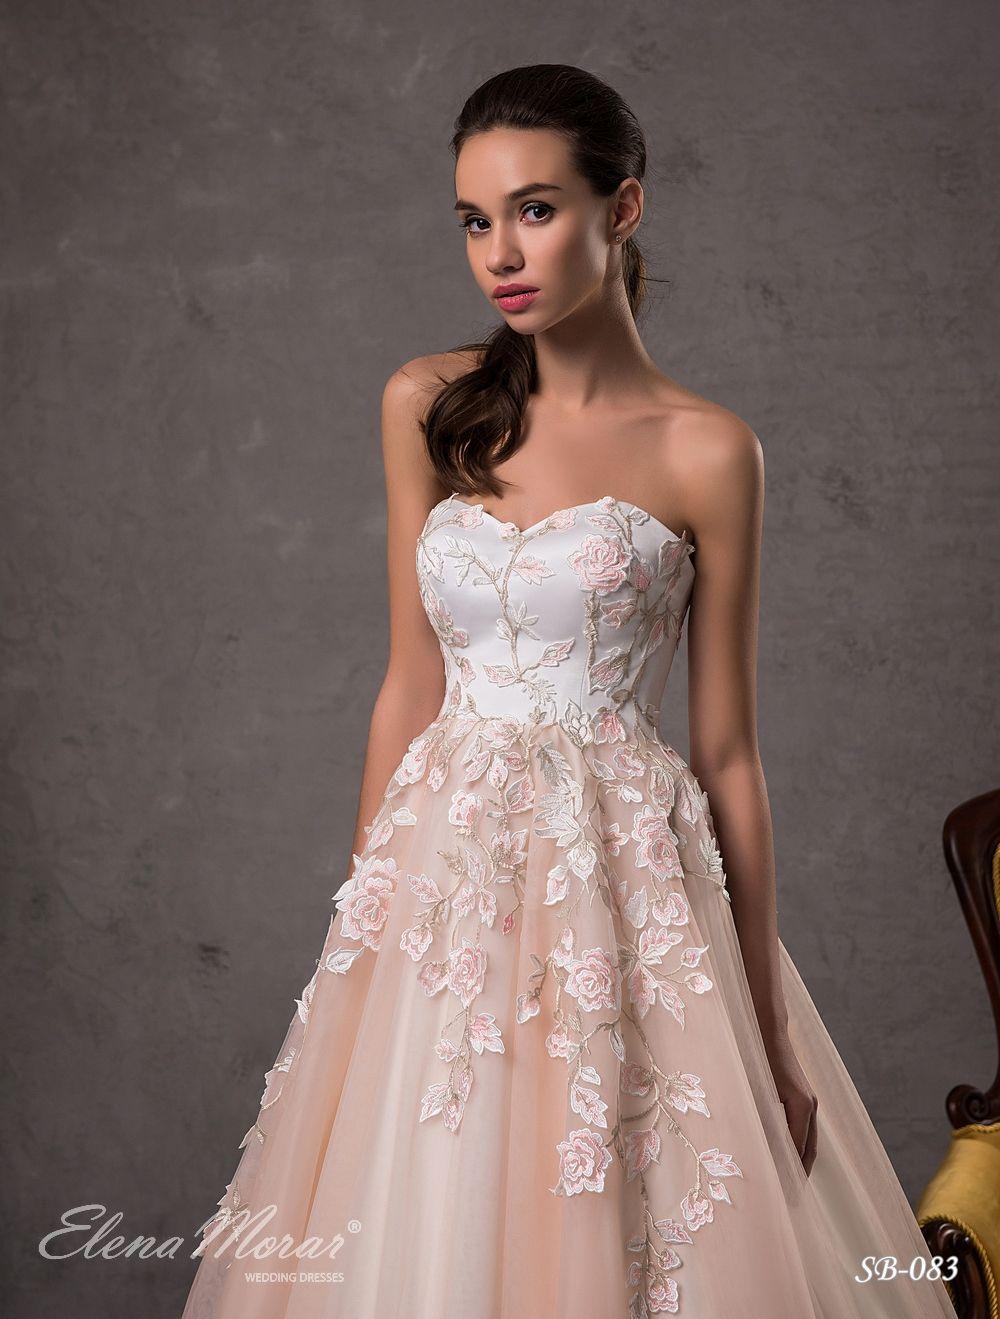 Wedding Dress By Elena Morar Designer In Charmé Gaby Bridal Gown Boutique Clearwater Fl